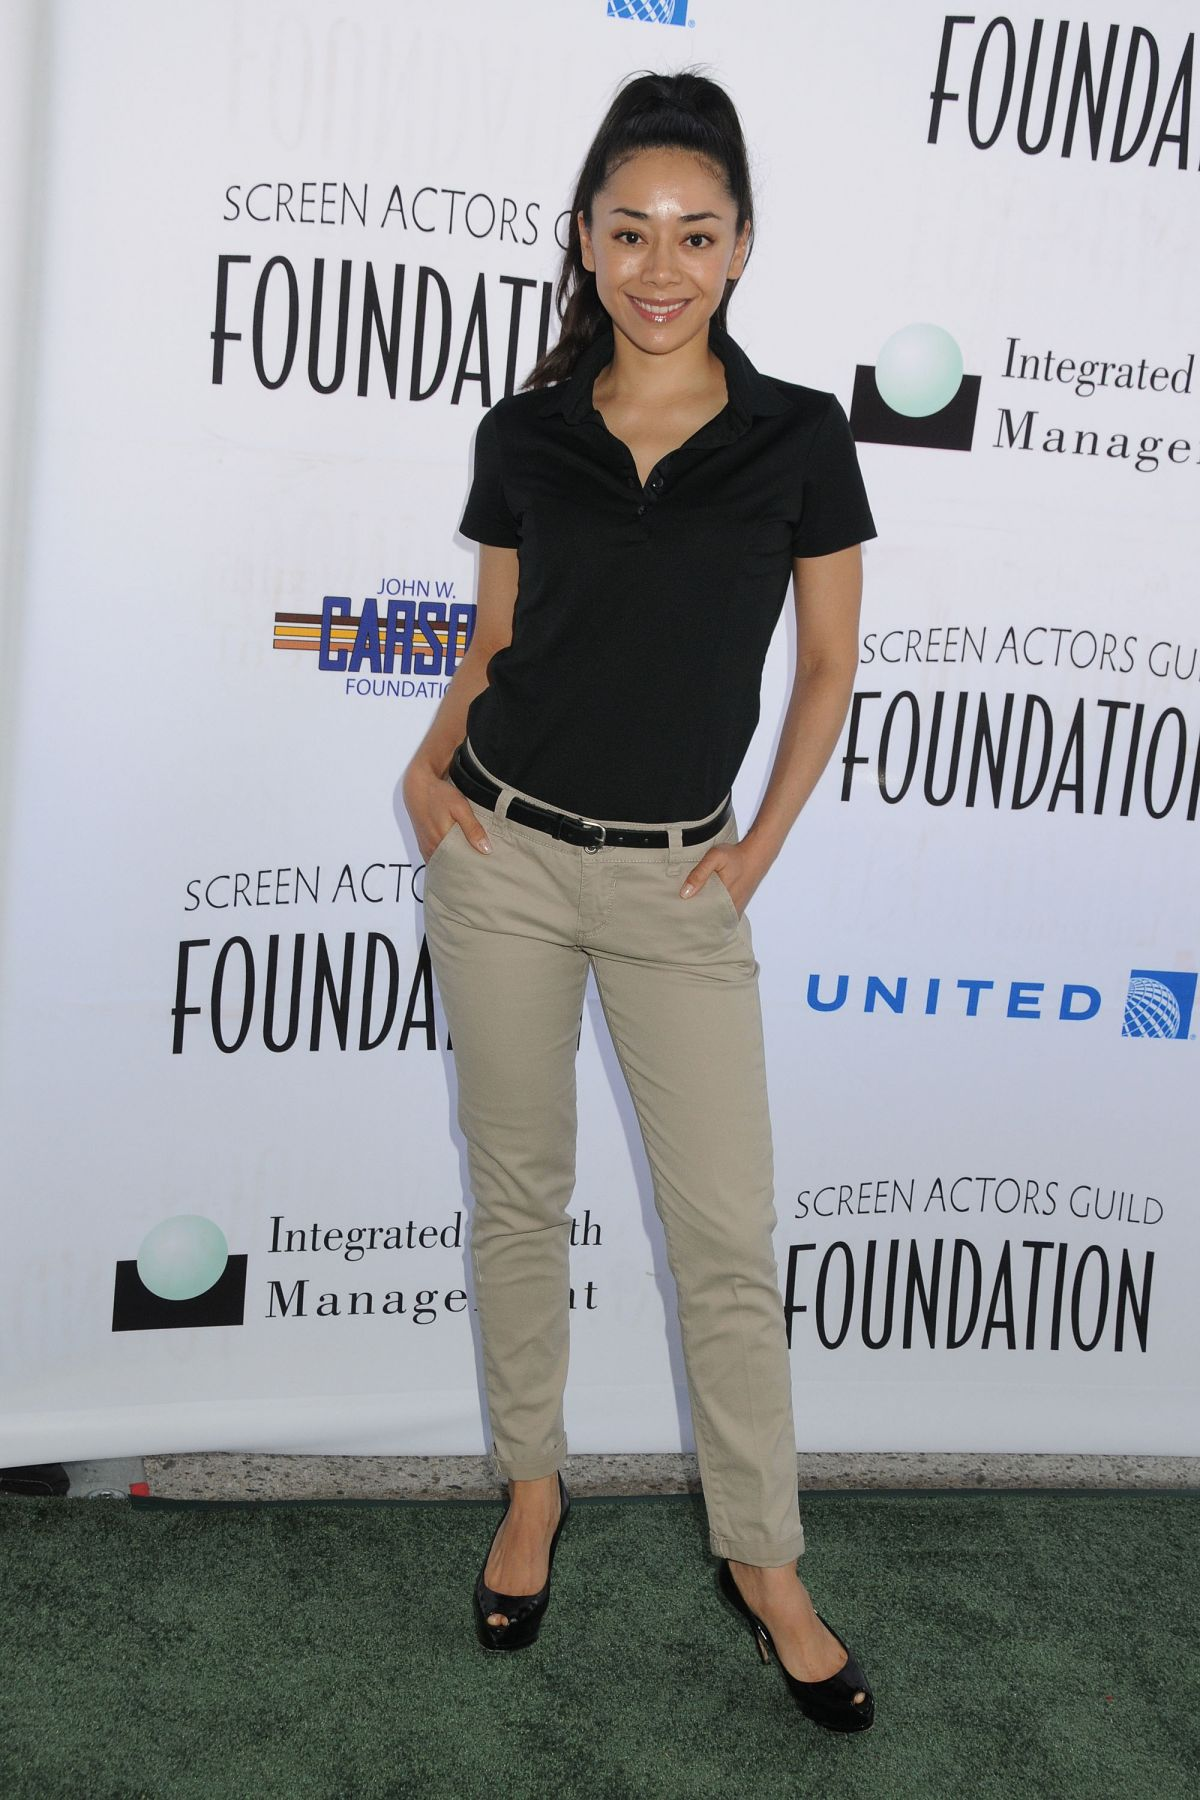 AIMEE GARCIA at SAG Foundation 5th Annual Golf Classic in Burbank